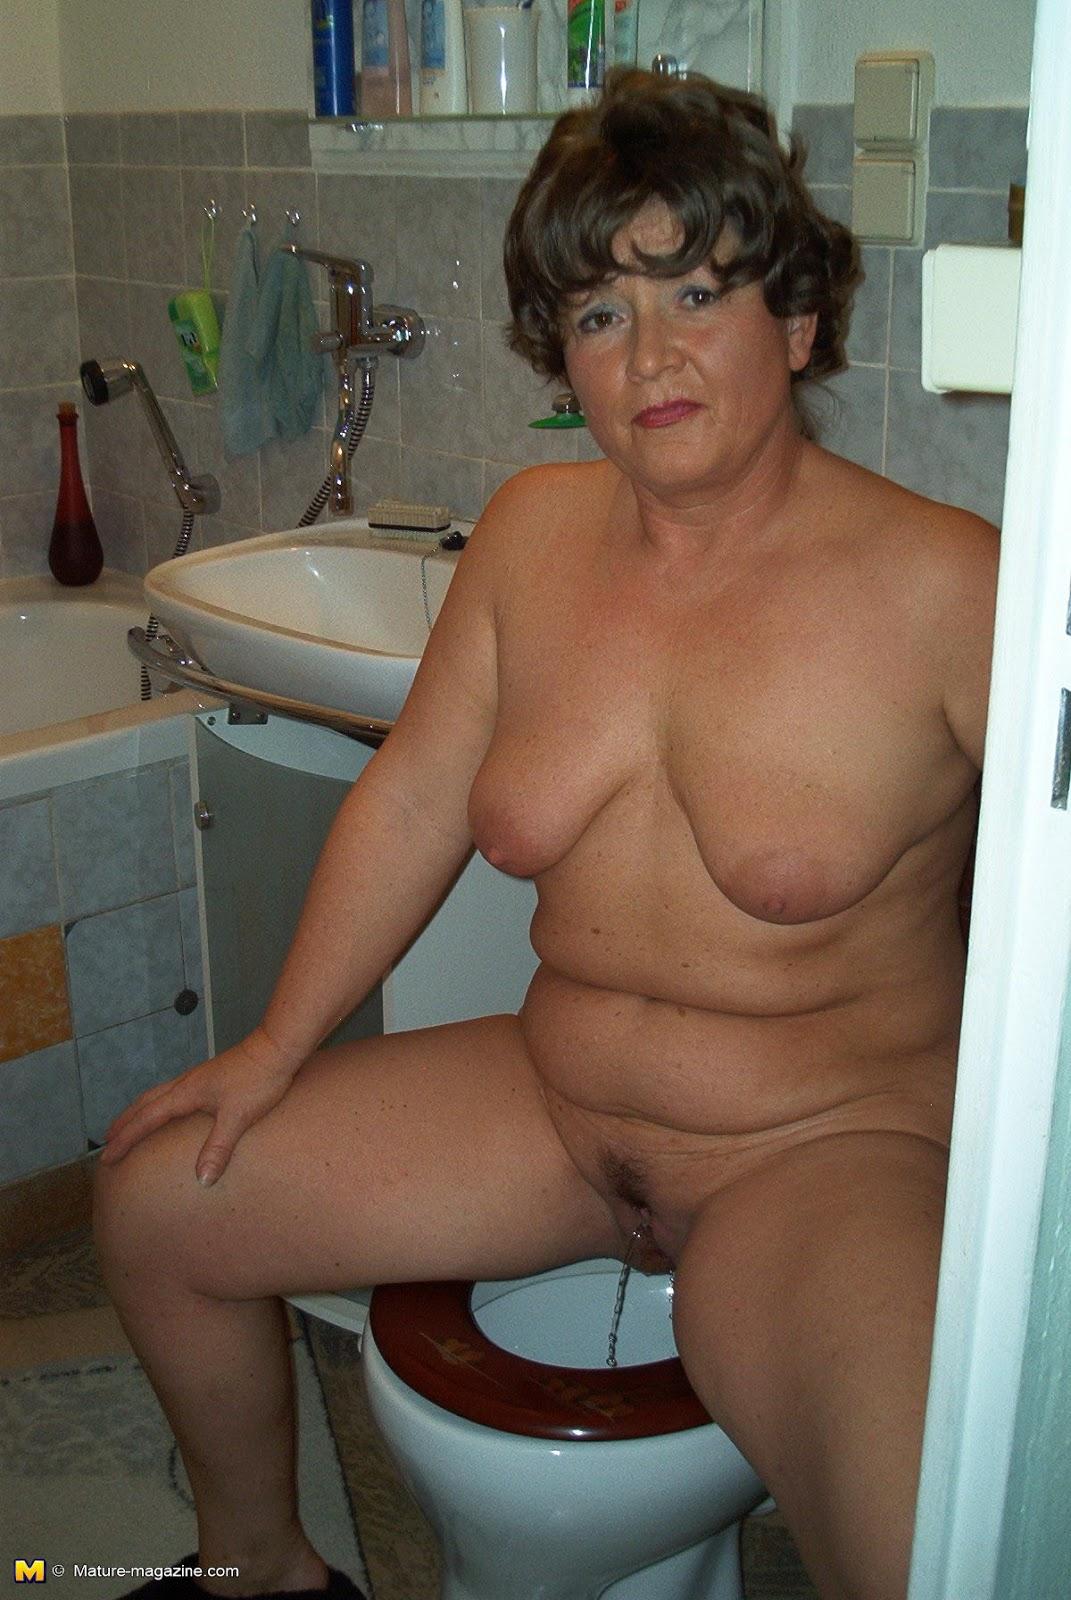 Xxx grandma peeing hq photo porno